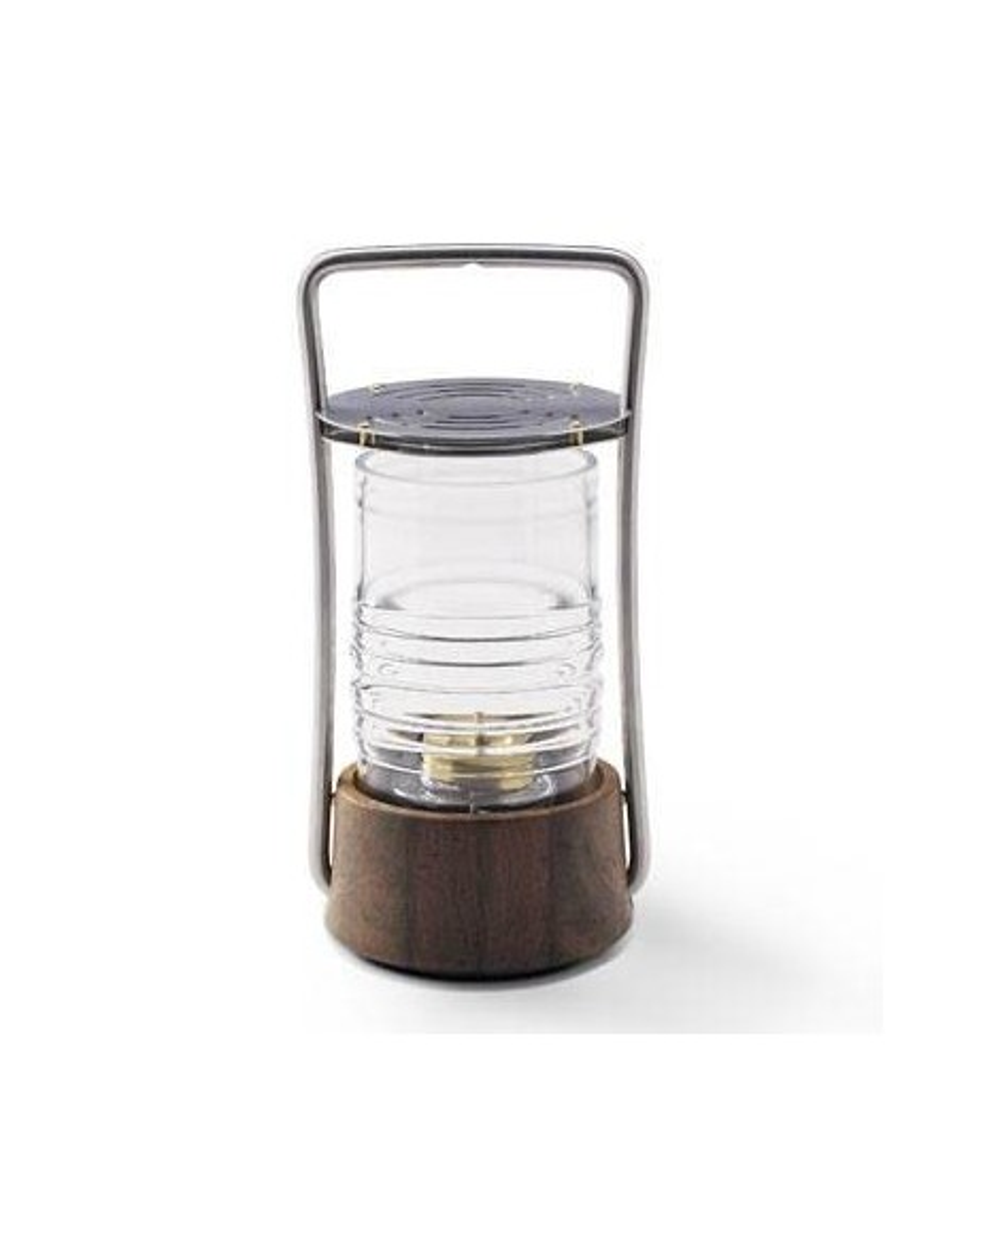 BOLLARD OIL LAMP